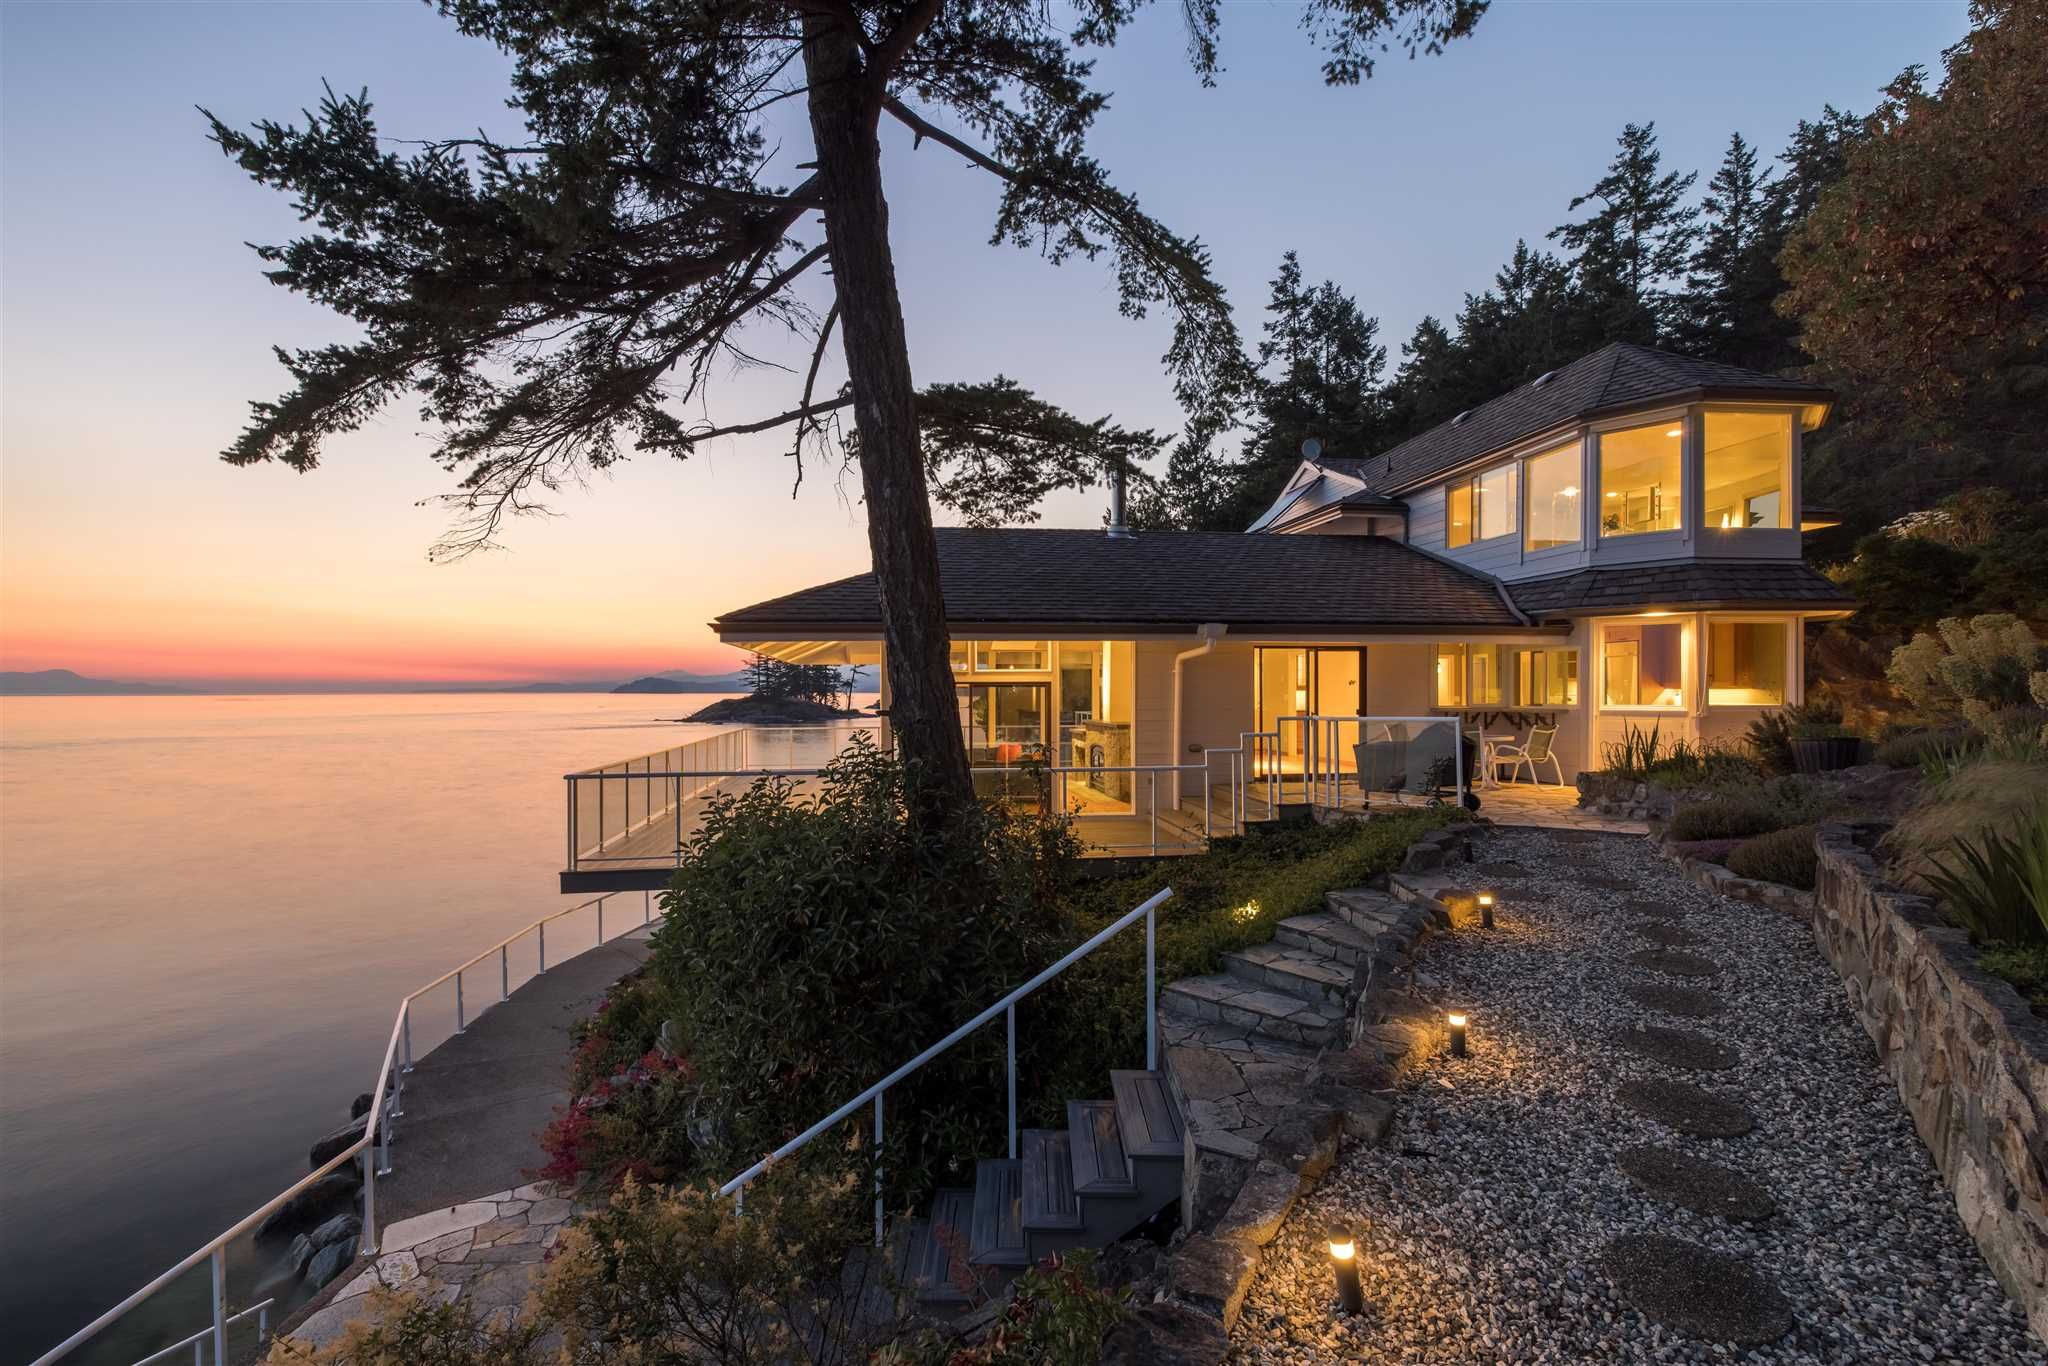 Main Photo: 11113 SUNSHINE COAST Highway in Halfmoon Bay: Halfmn Bay Secret Cv Redroofs House for sale (Sunshine Coast)  : MLS®# R2537674